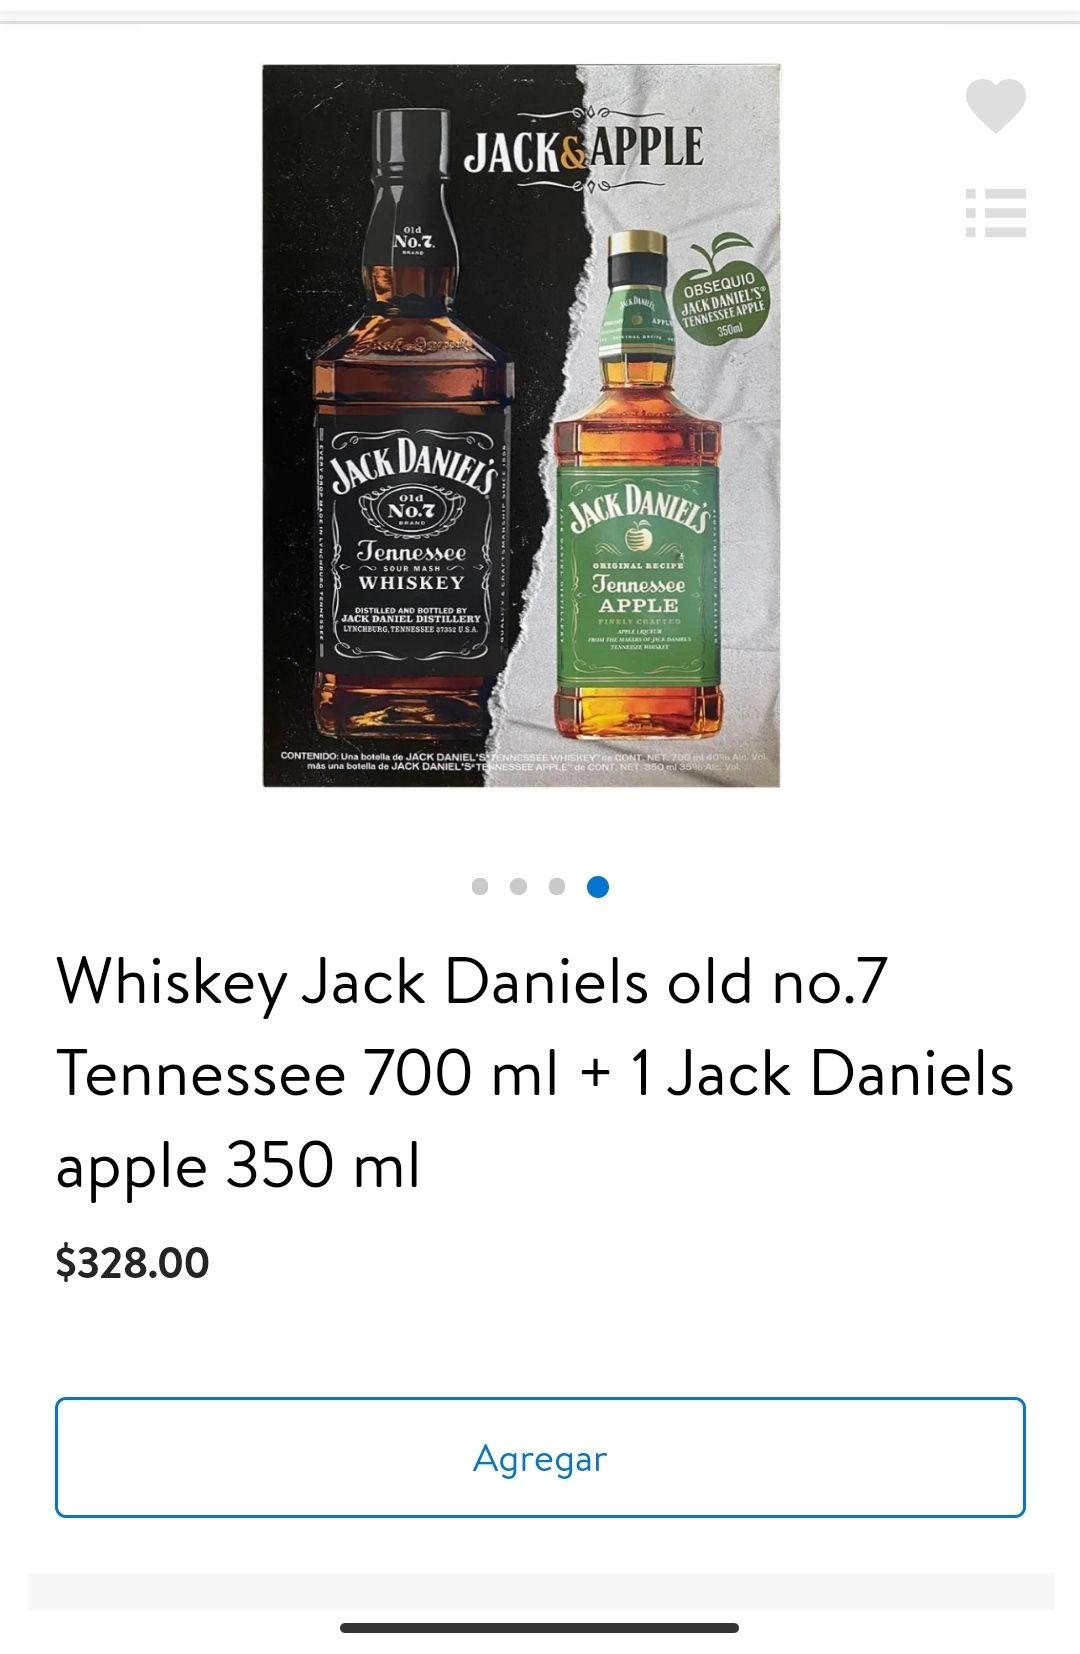 Walmart: Whiskey Jack Daniels old no.7 Tennessee 700 ml + 1 Jack Daniels apple 350 ml